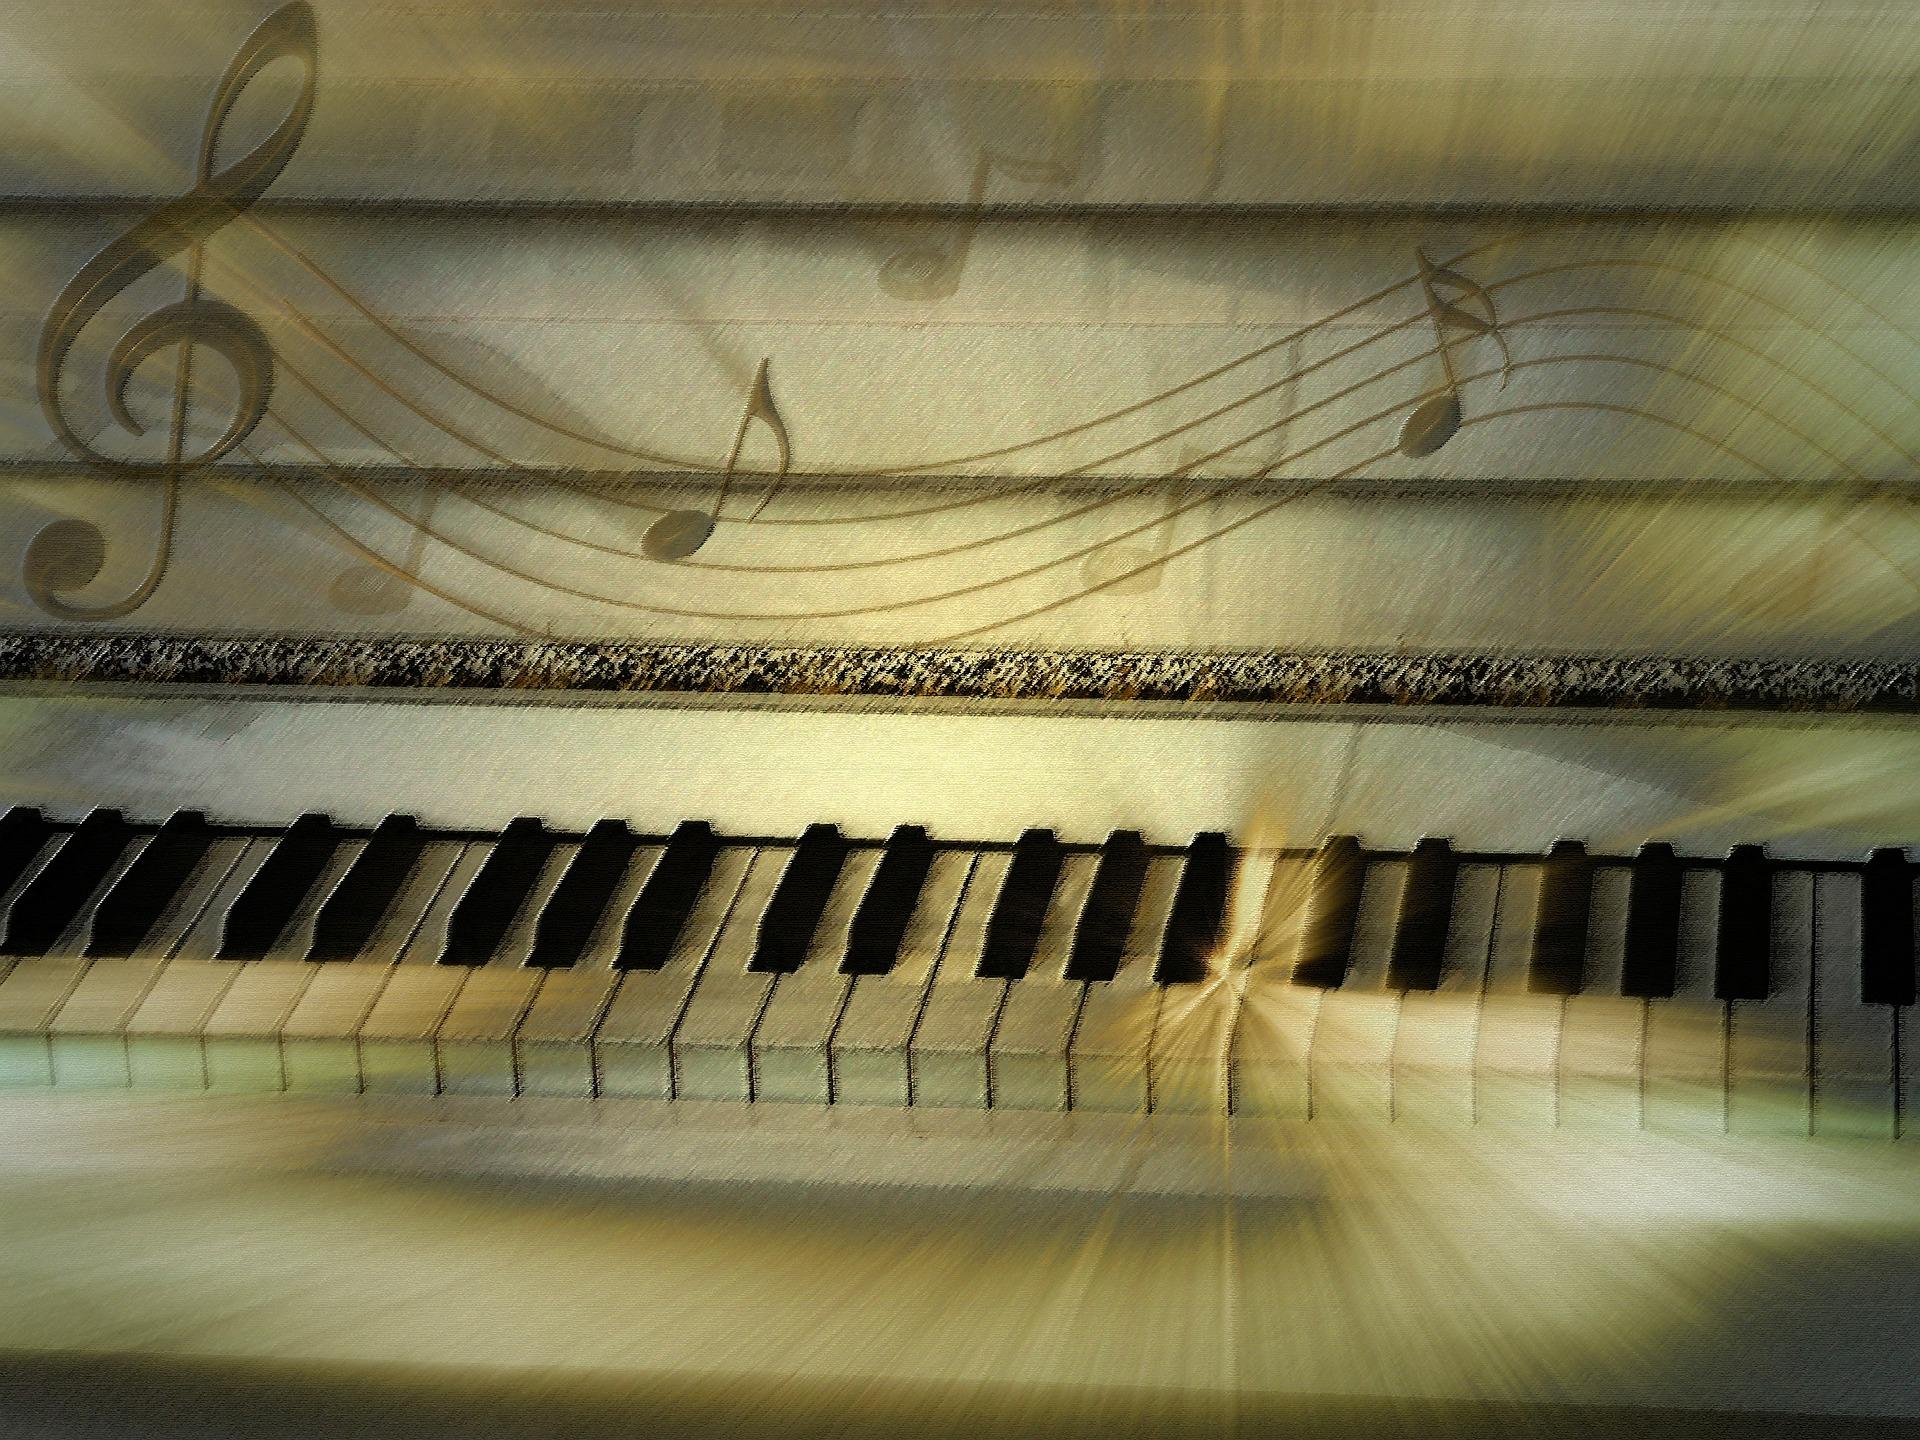 music-407654_1920